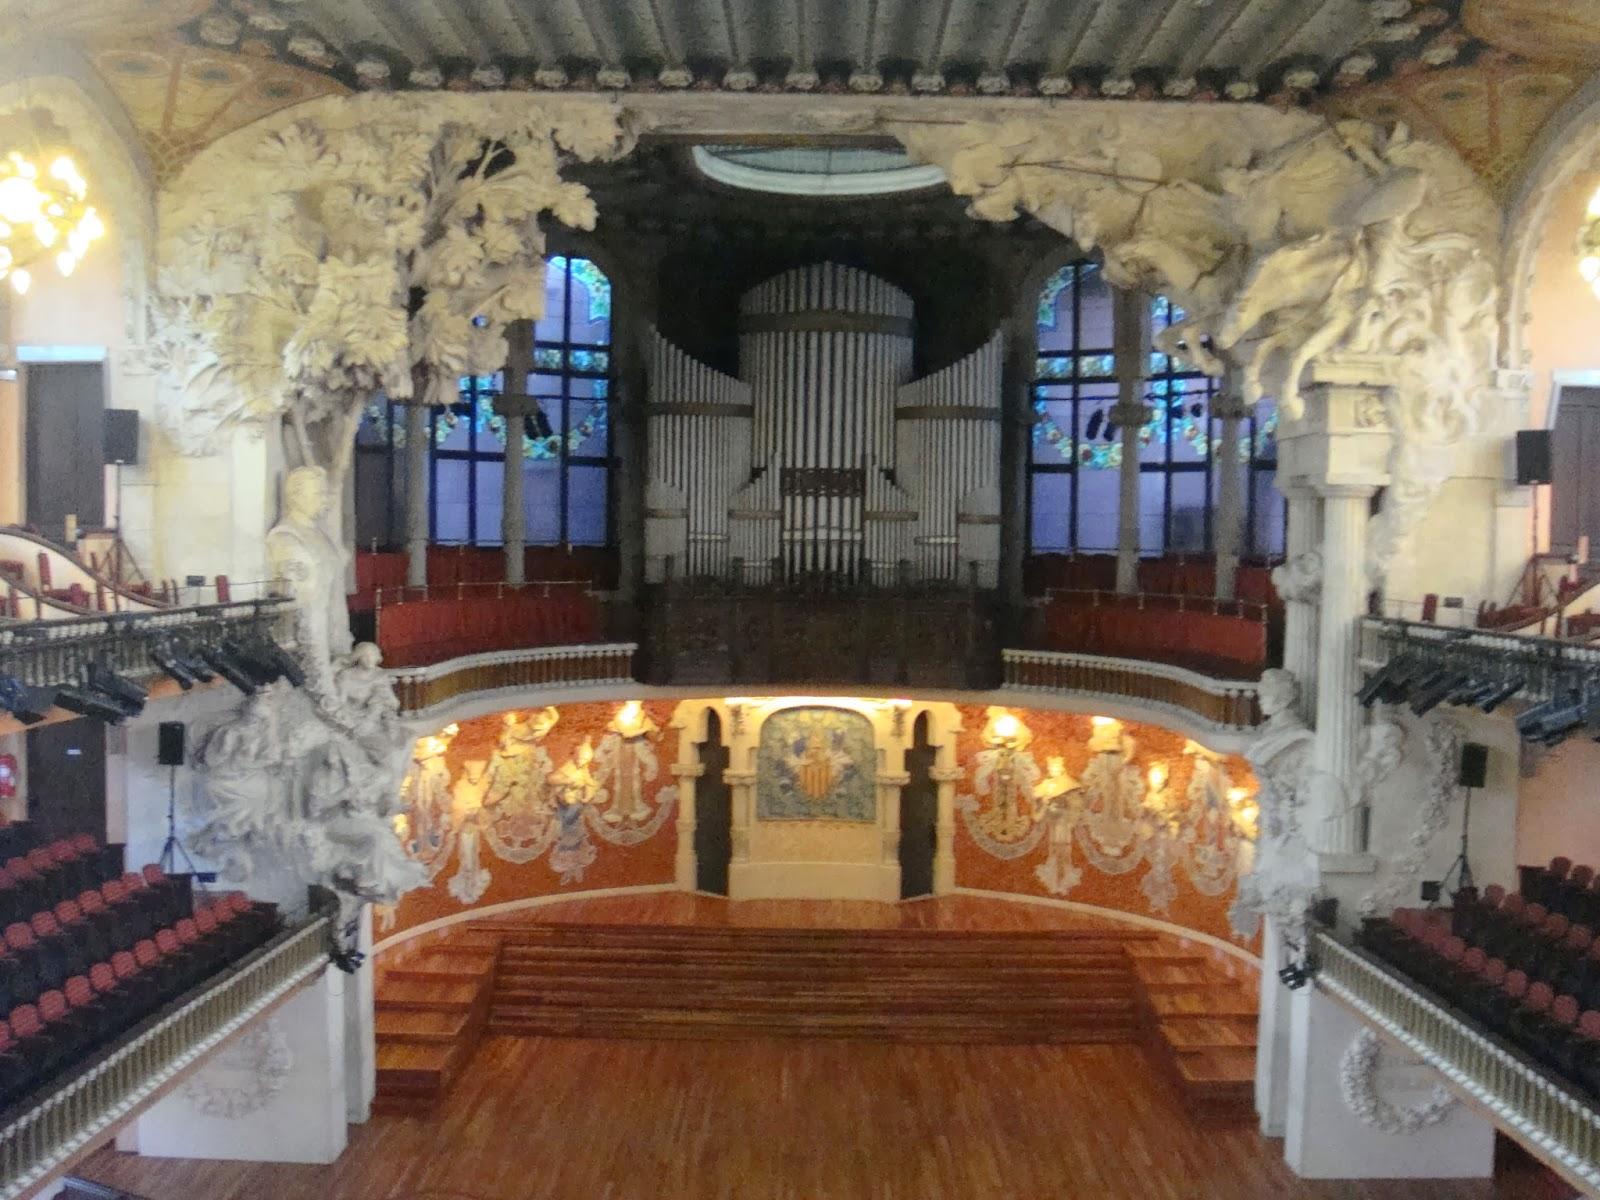 Palau de la Música Catalana enBarcelona